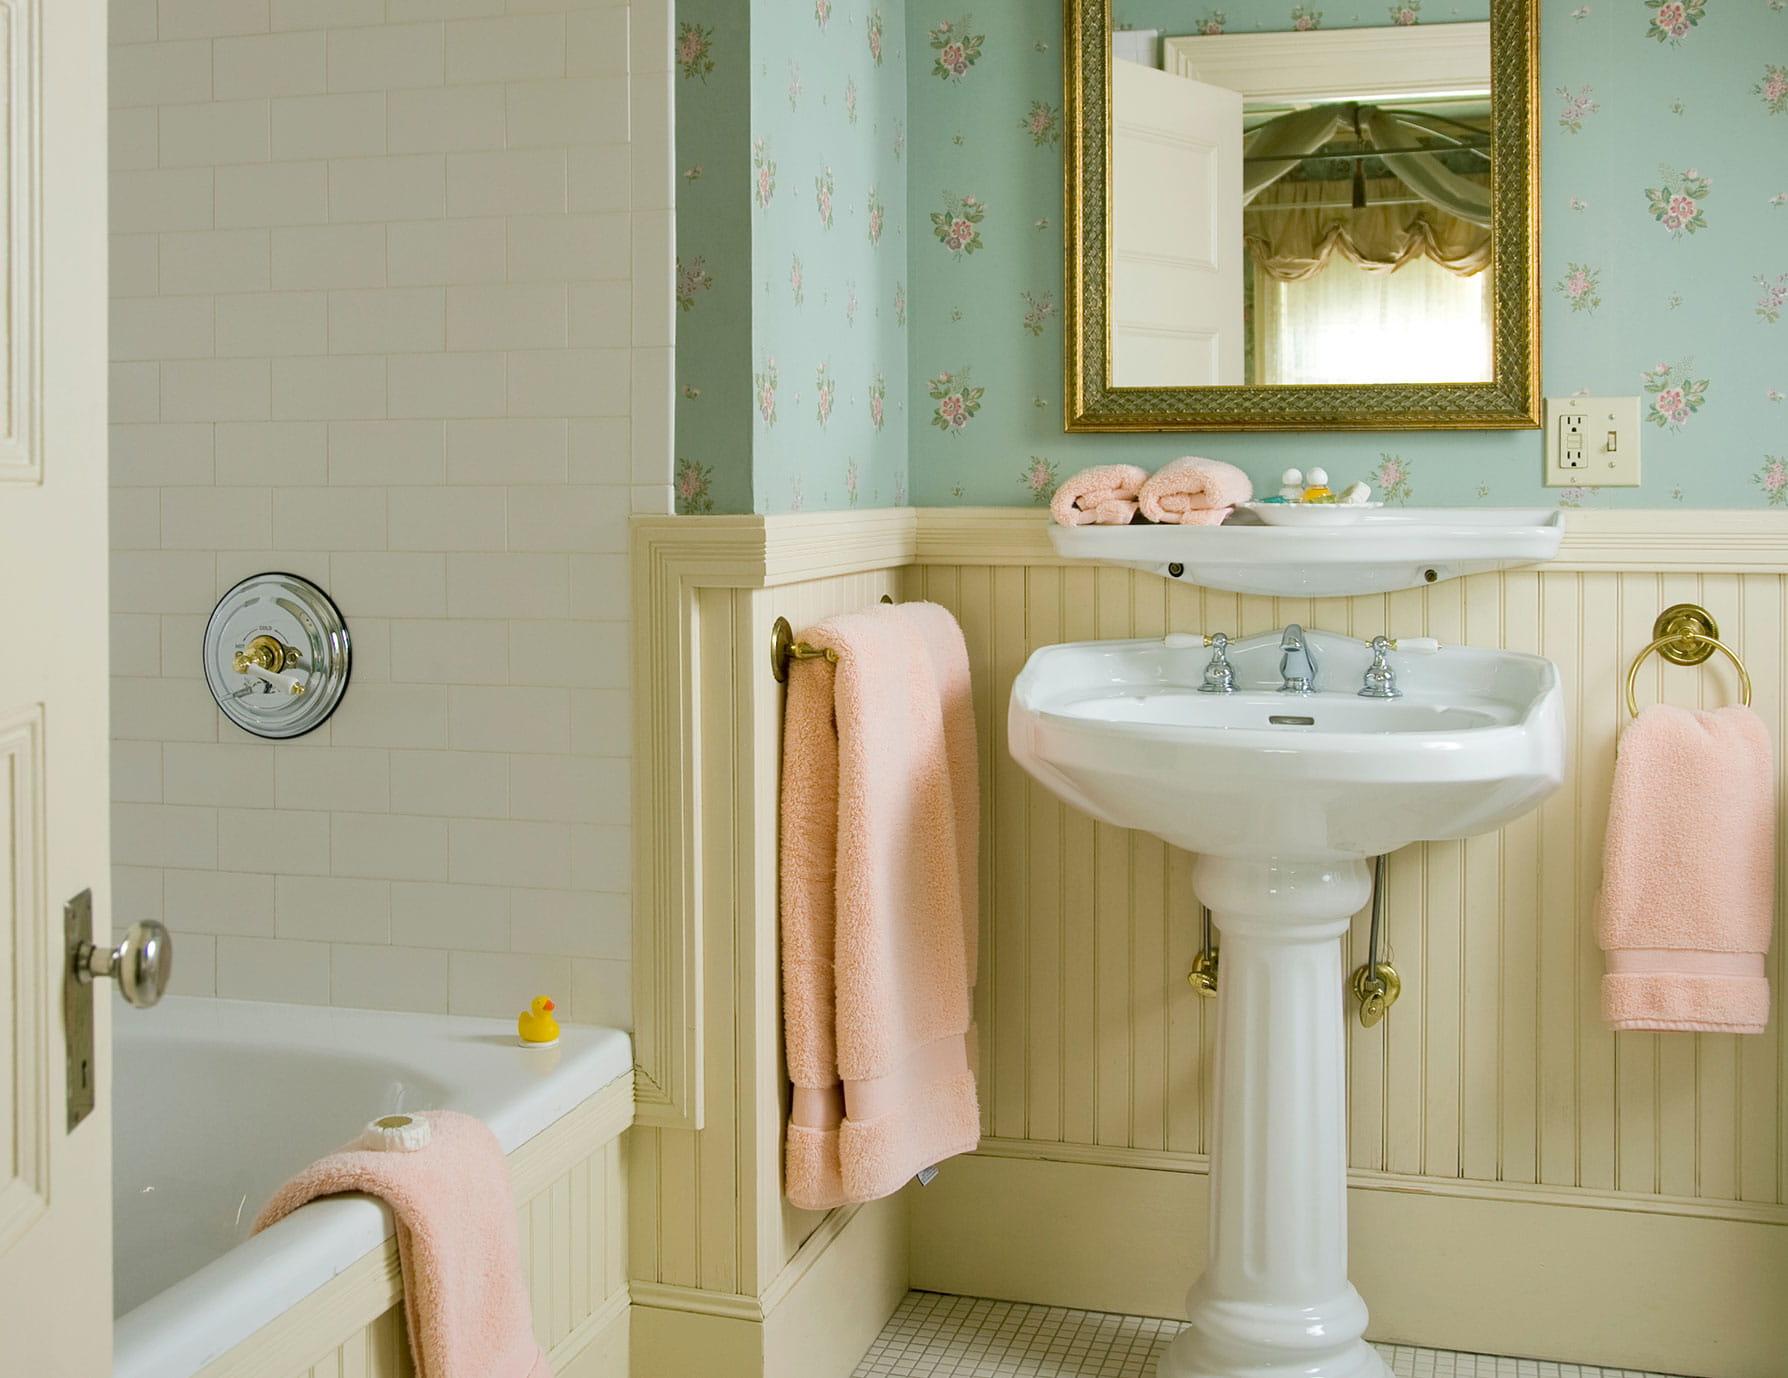 Sink by clean towels and bathtub